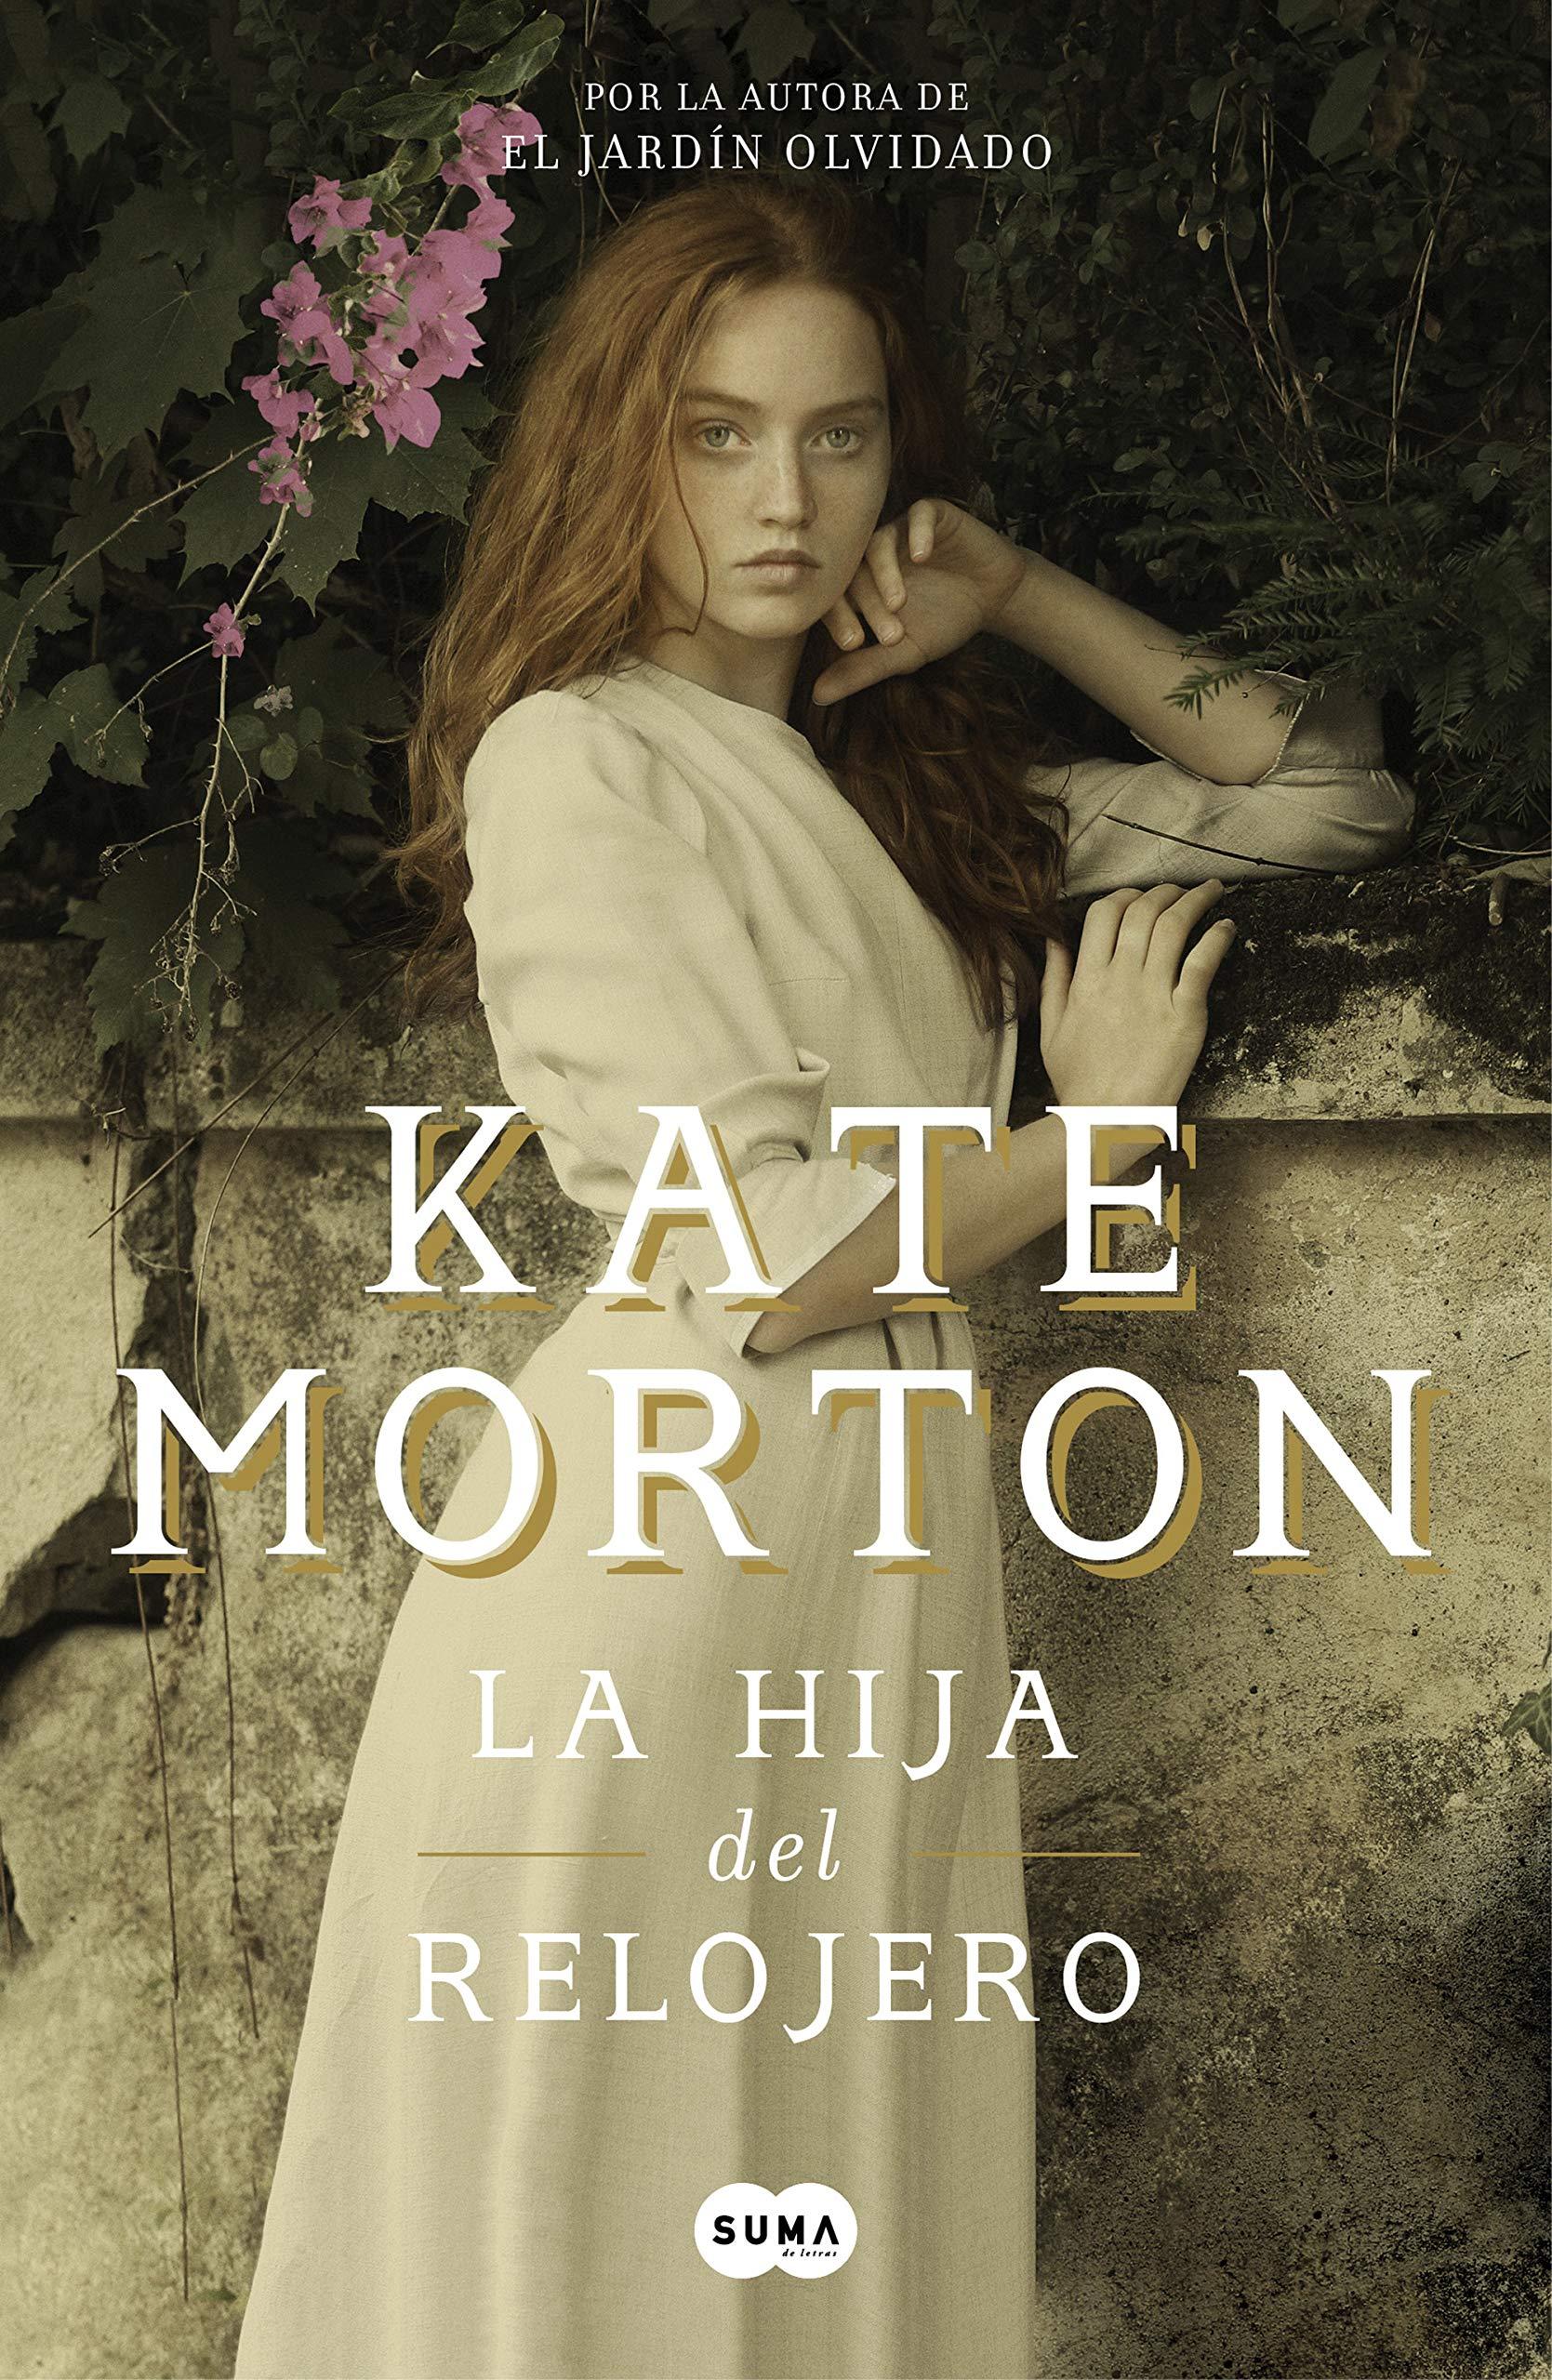 La hija del relojero (Femenino singular): Amazon.es: Morton, Kate, Máximo Sáez Escribano;: Libros